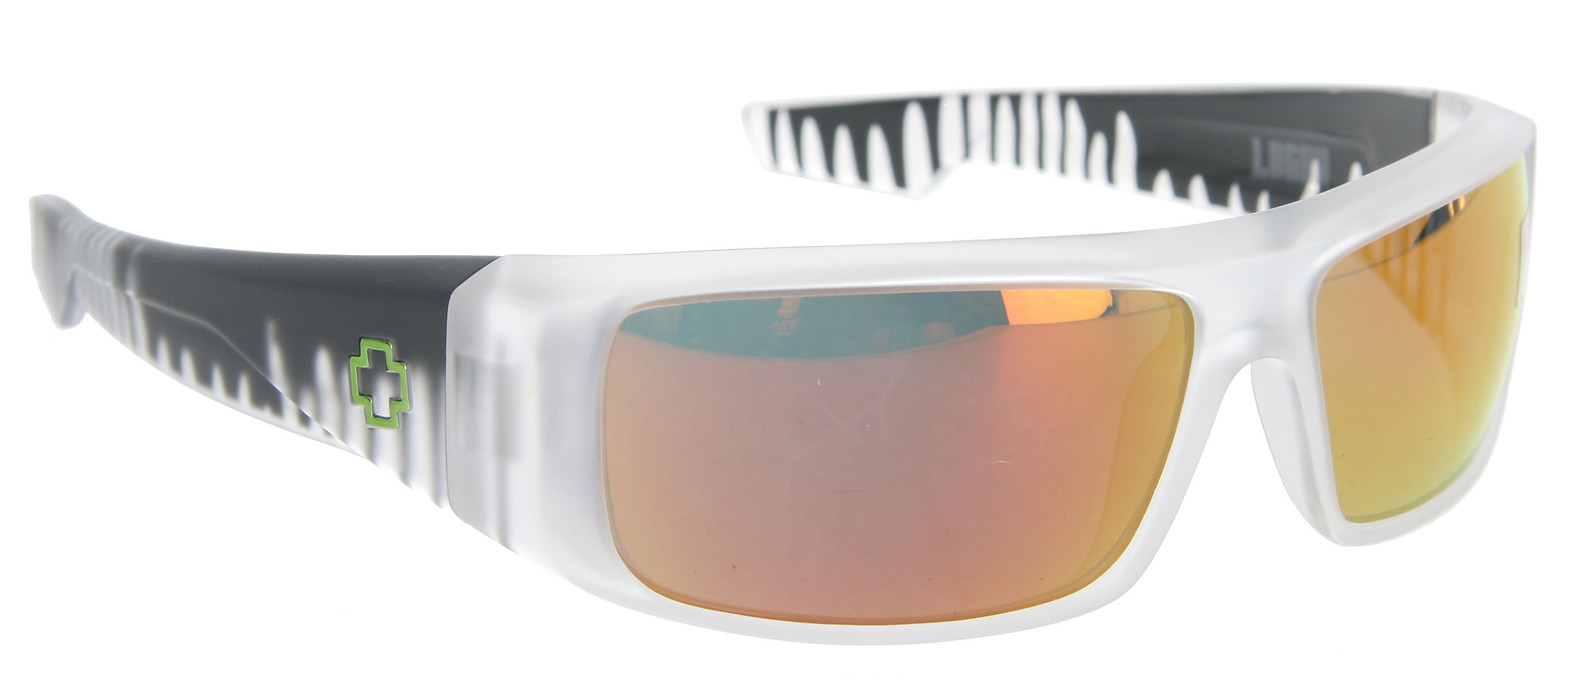 53de54e43 Spy Optic Spy Ken Block Logan Sunglasses Matte Crystal Drips/Grey ...